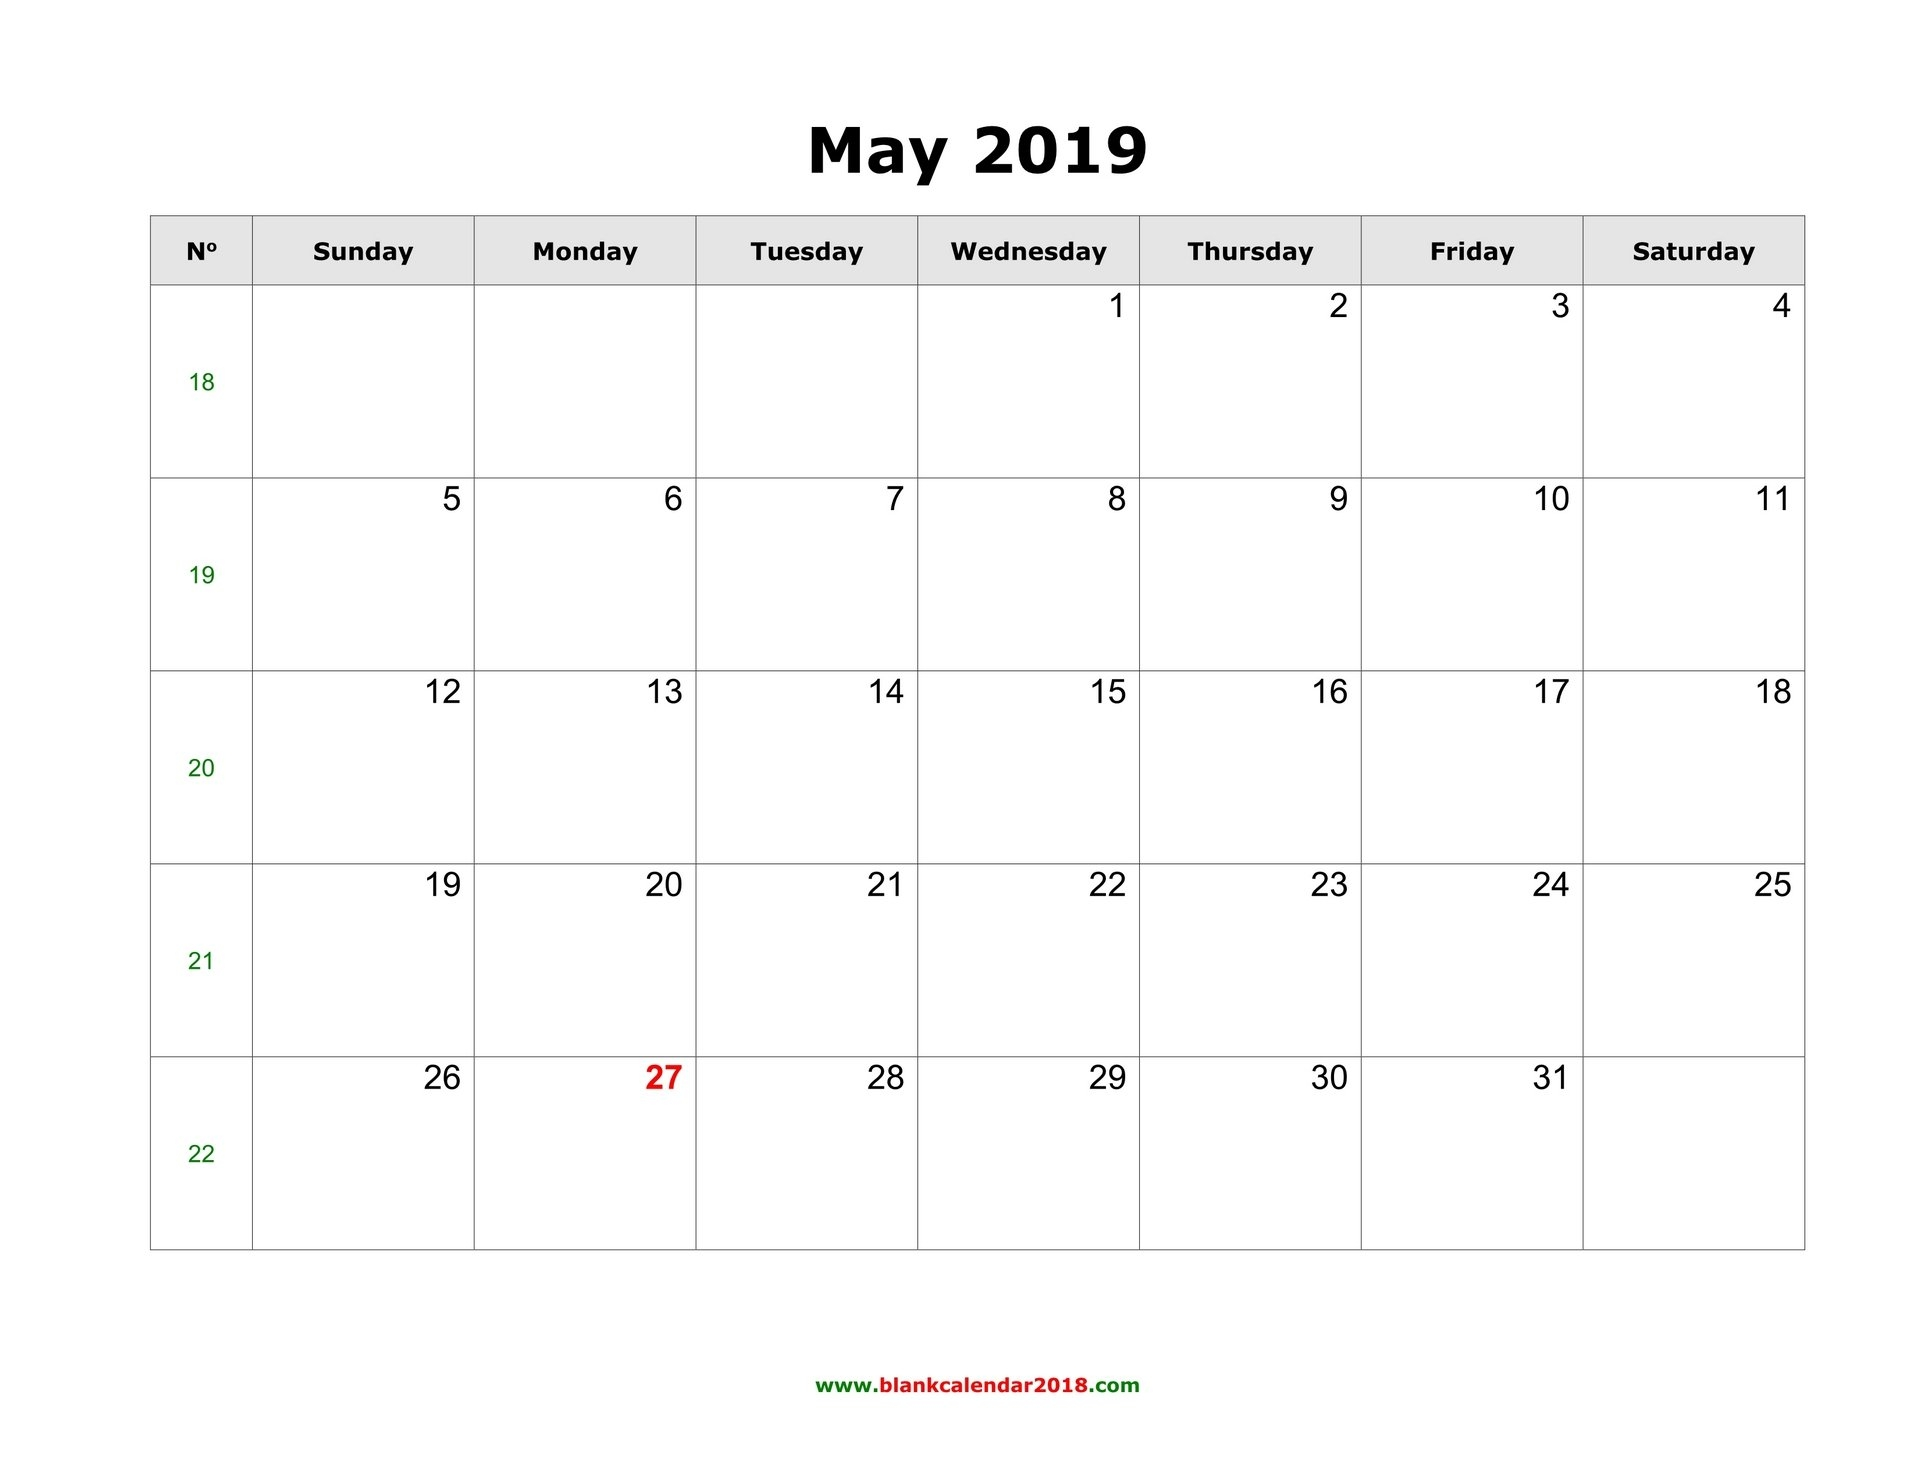 Blank Calendar For May 2019 Calendar Of 2019 May